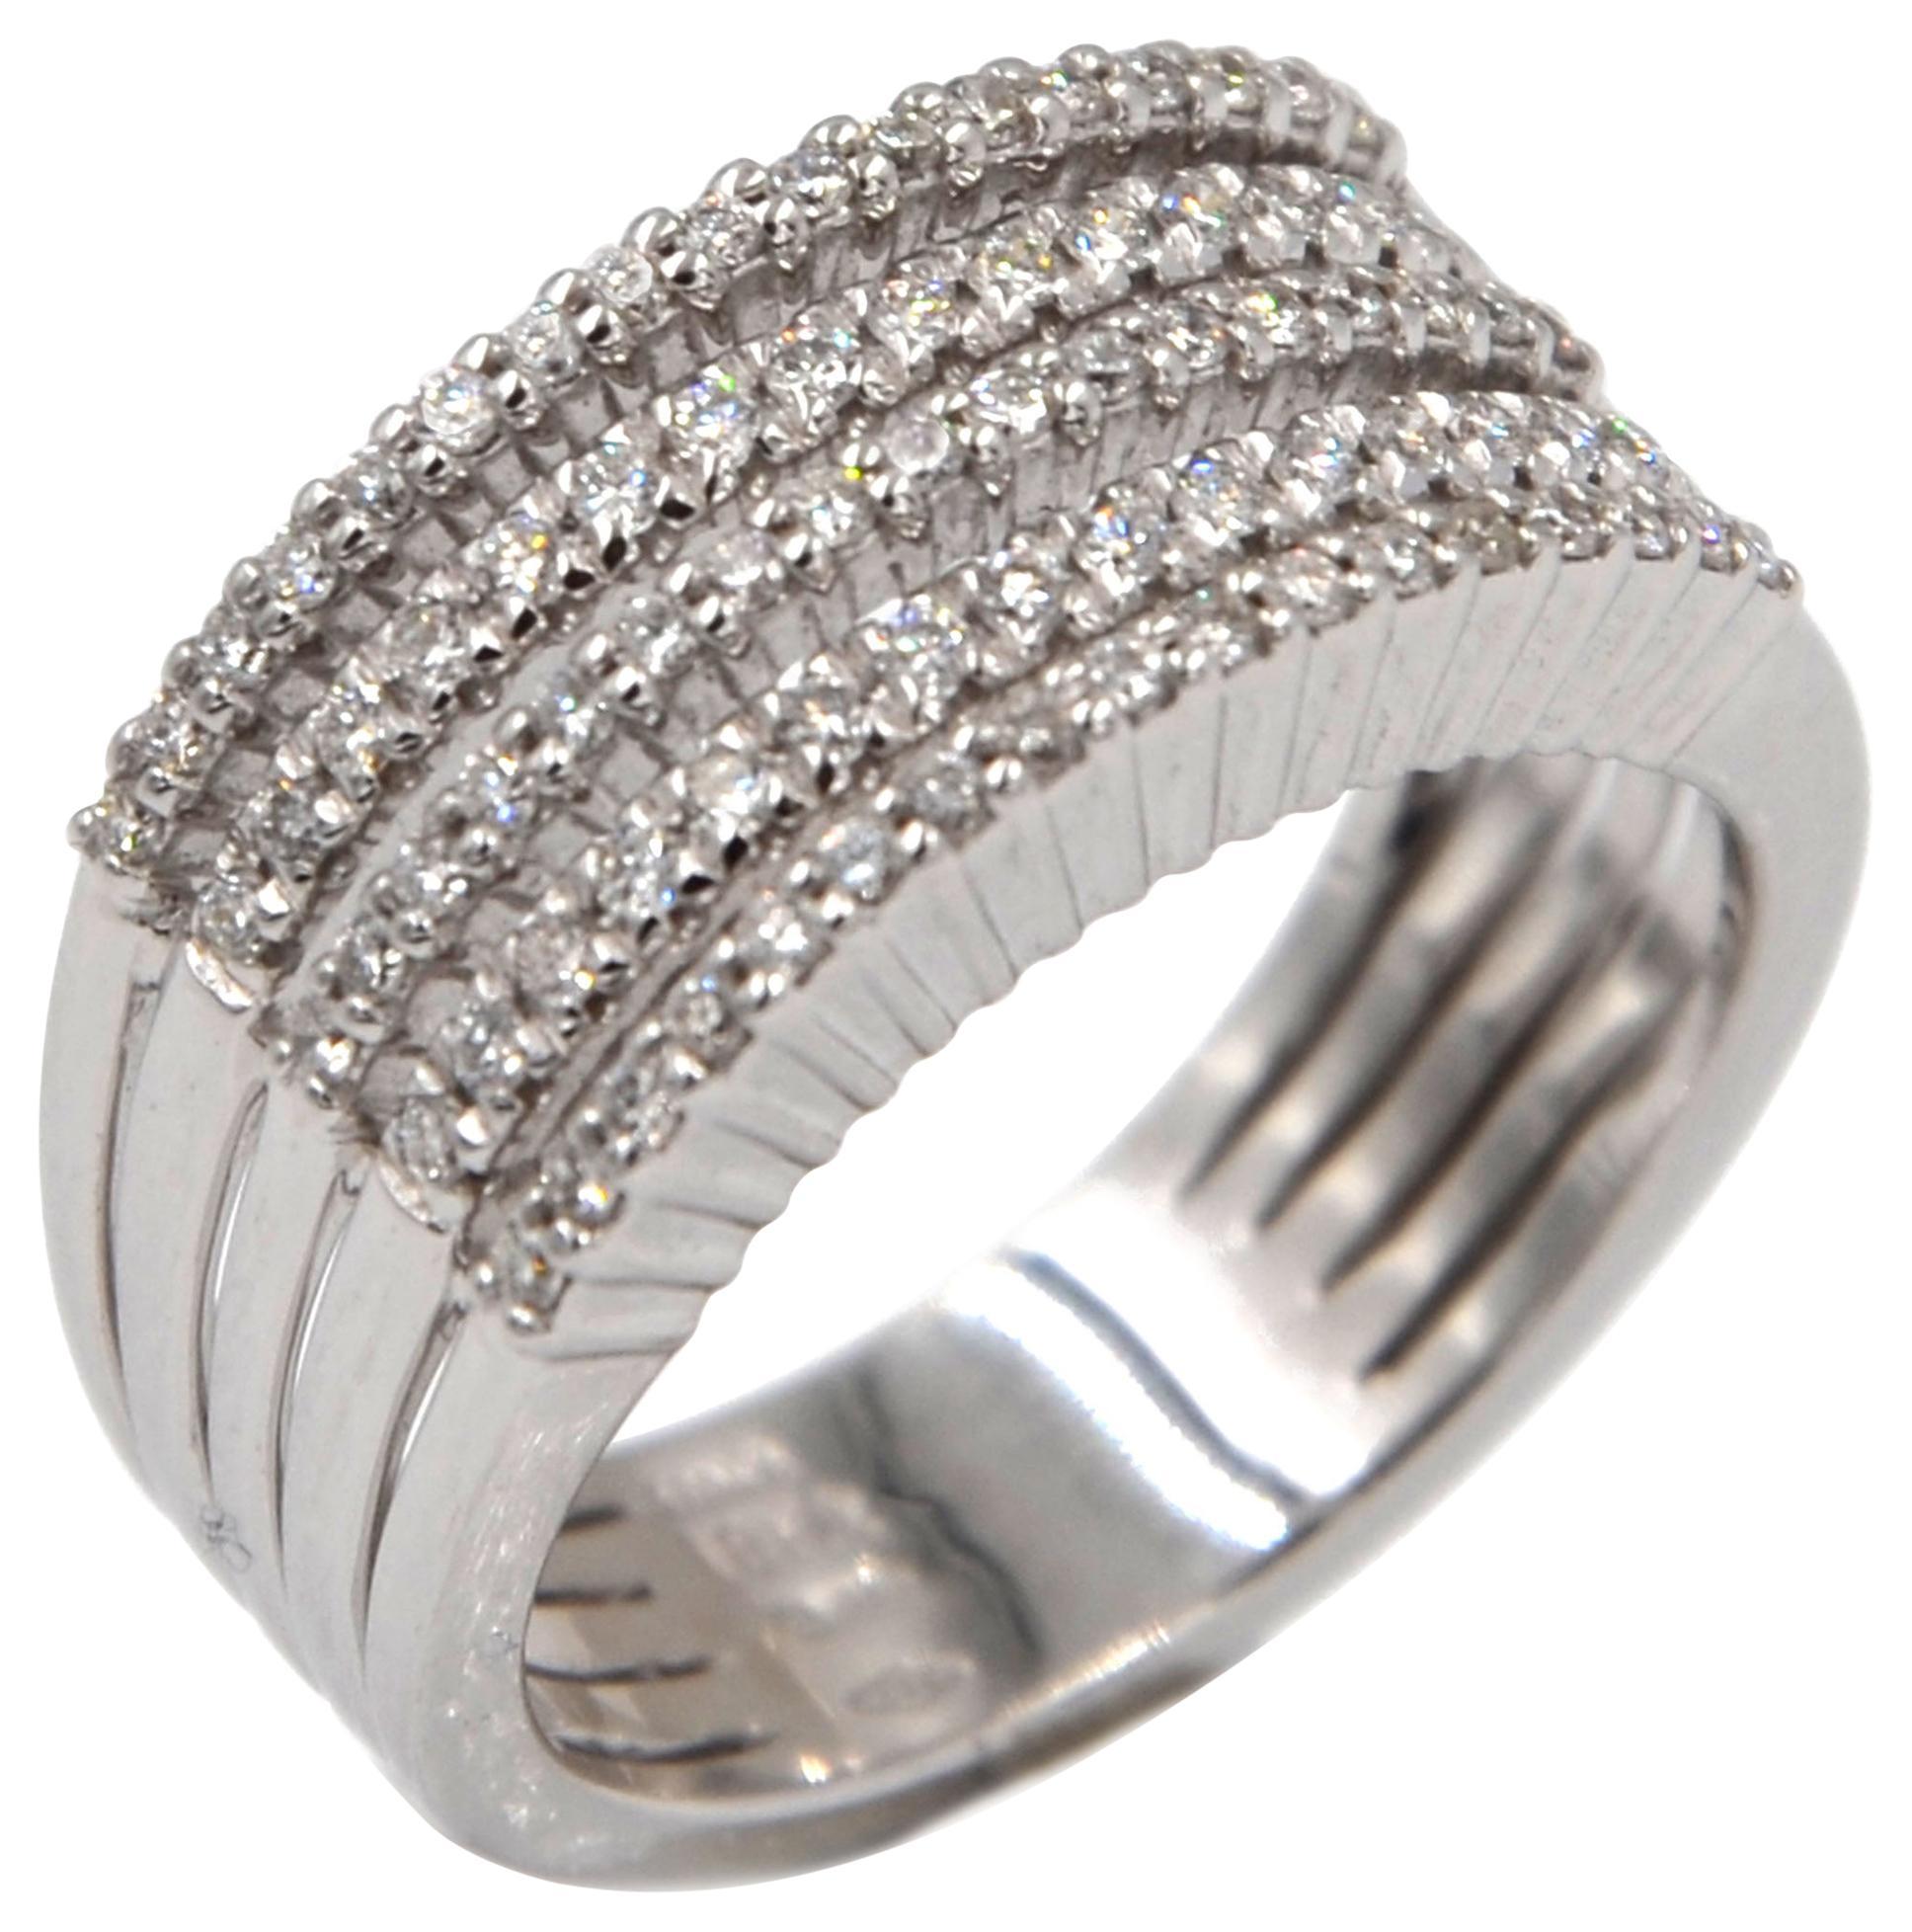 18 Karat White Gold Diamonds Garavelli Band Ring